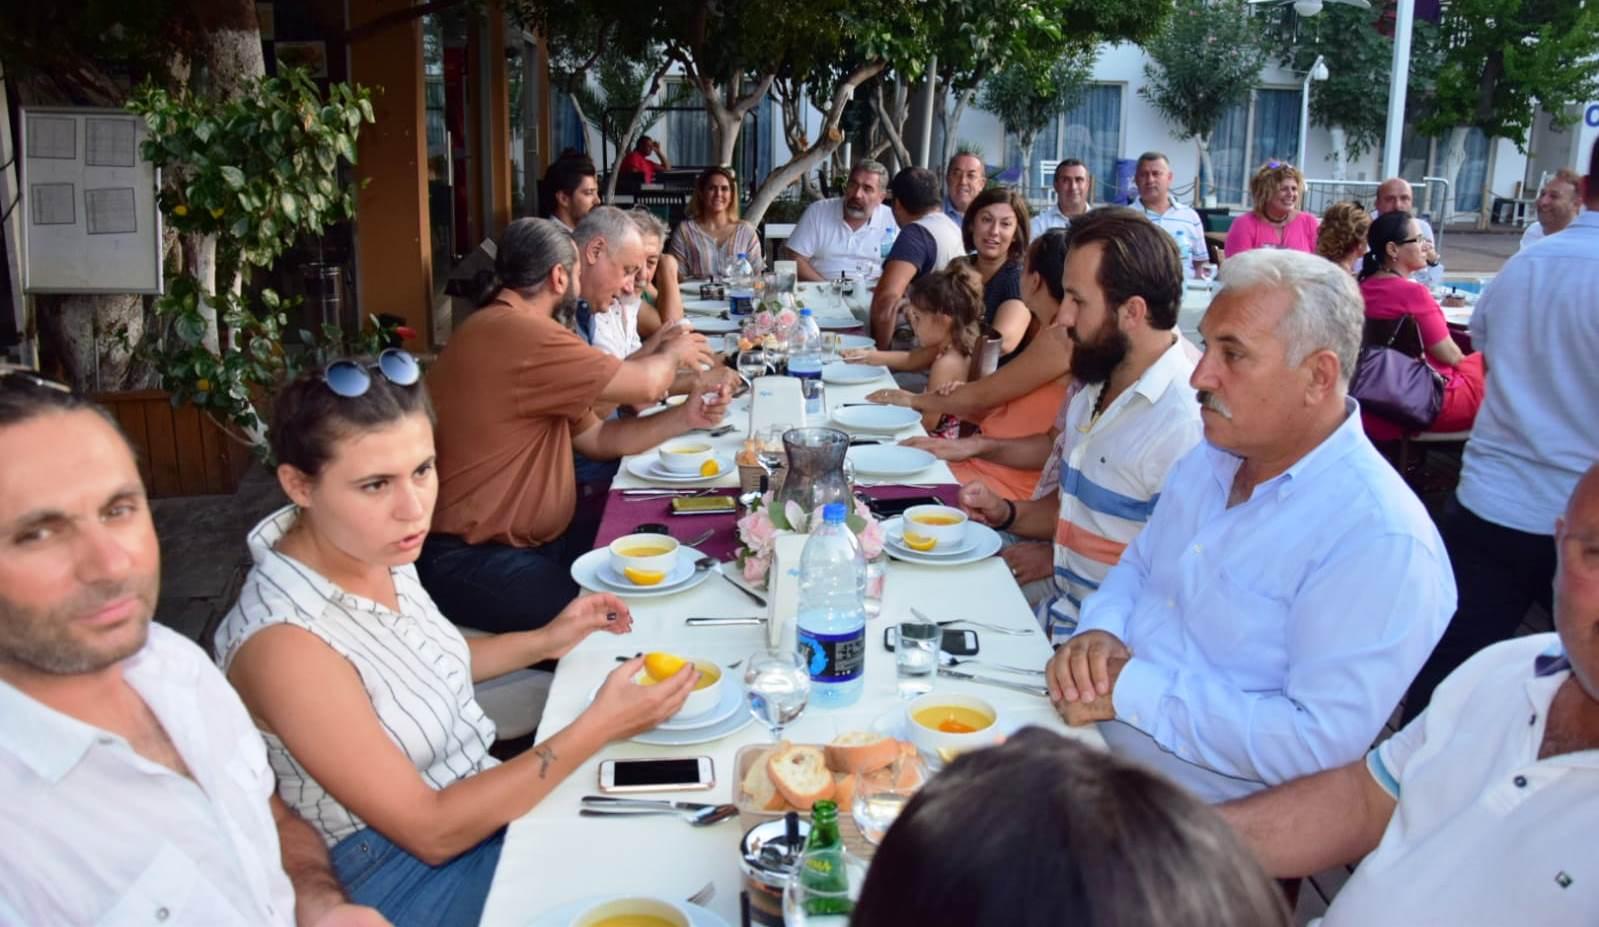 basın AK PARTİ BASIN MENSUPLARININ BAYRAMINI KUTLADI… ak parti basin mensuplari yemek 2